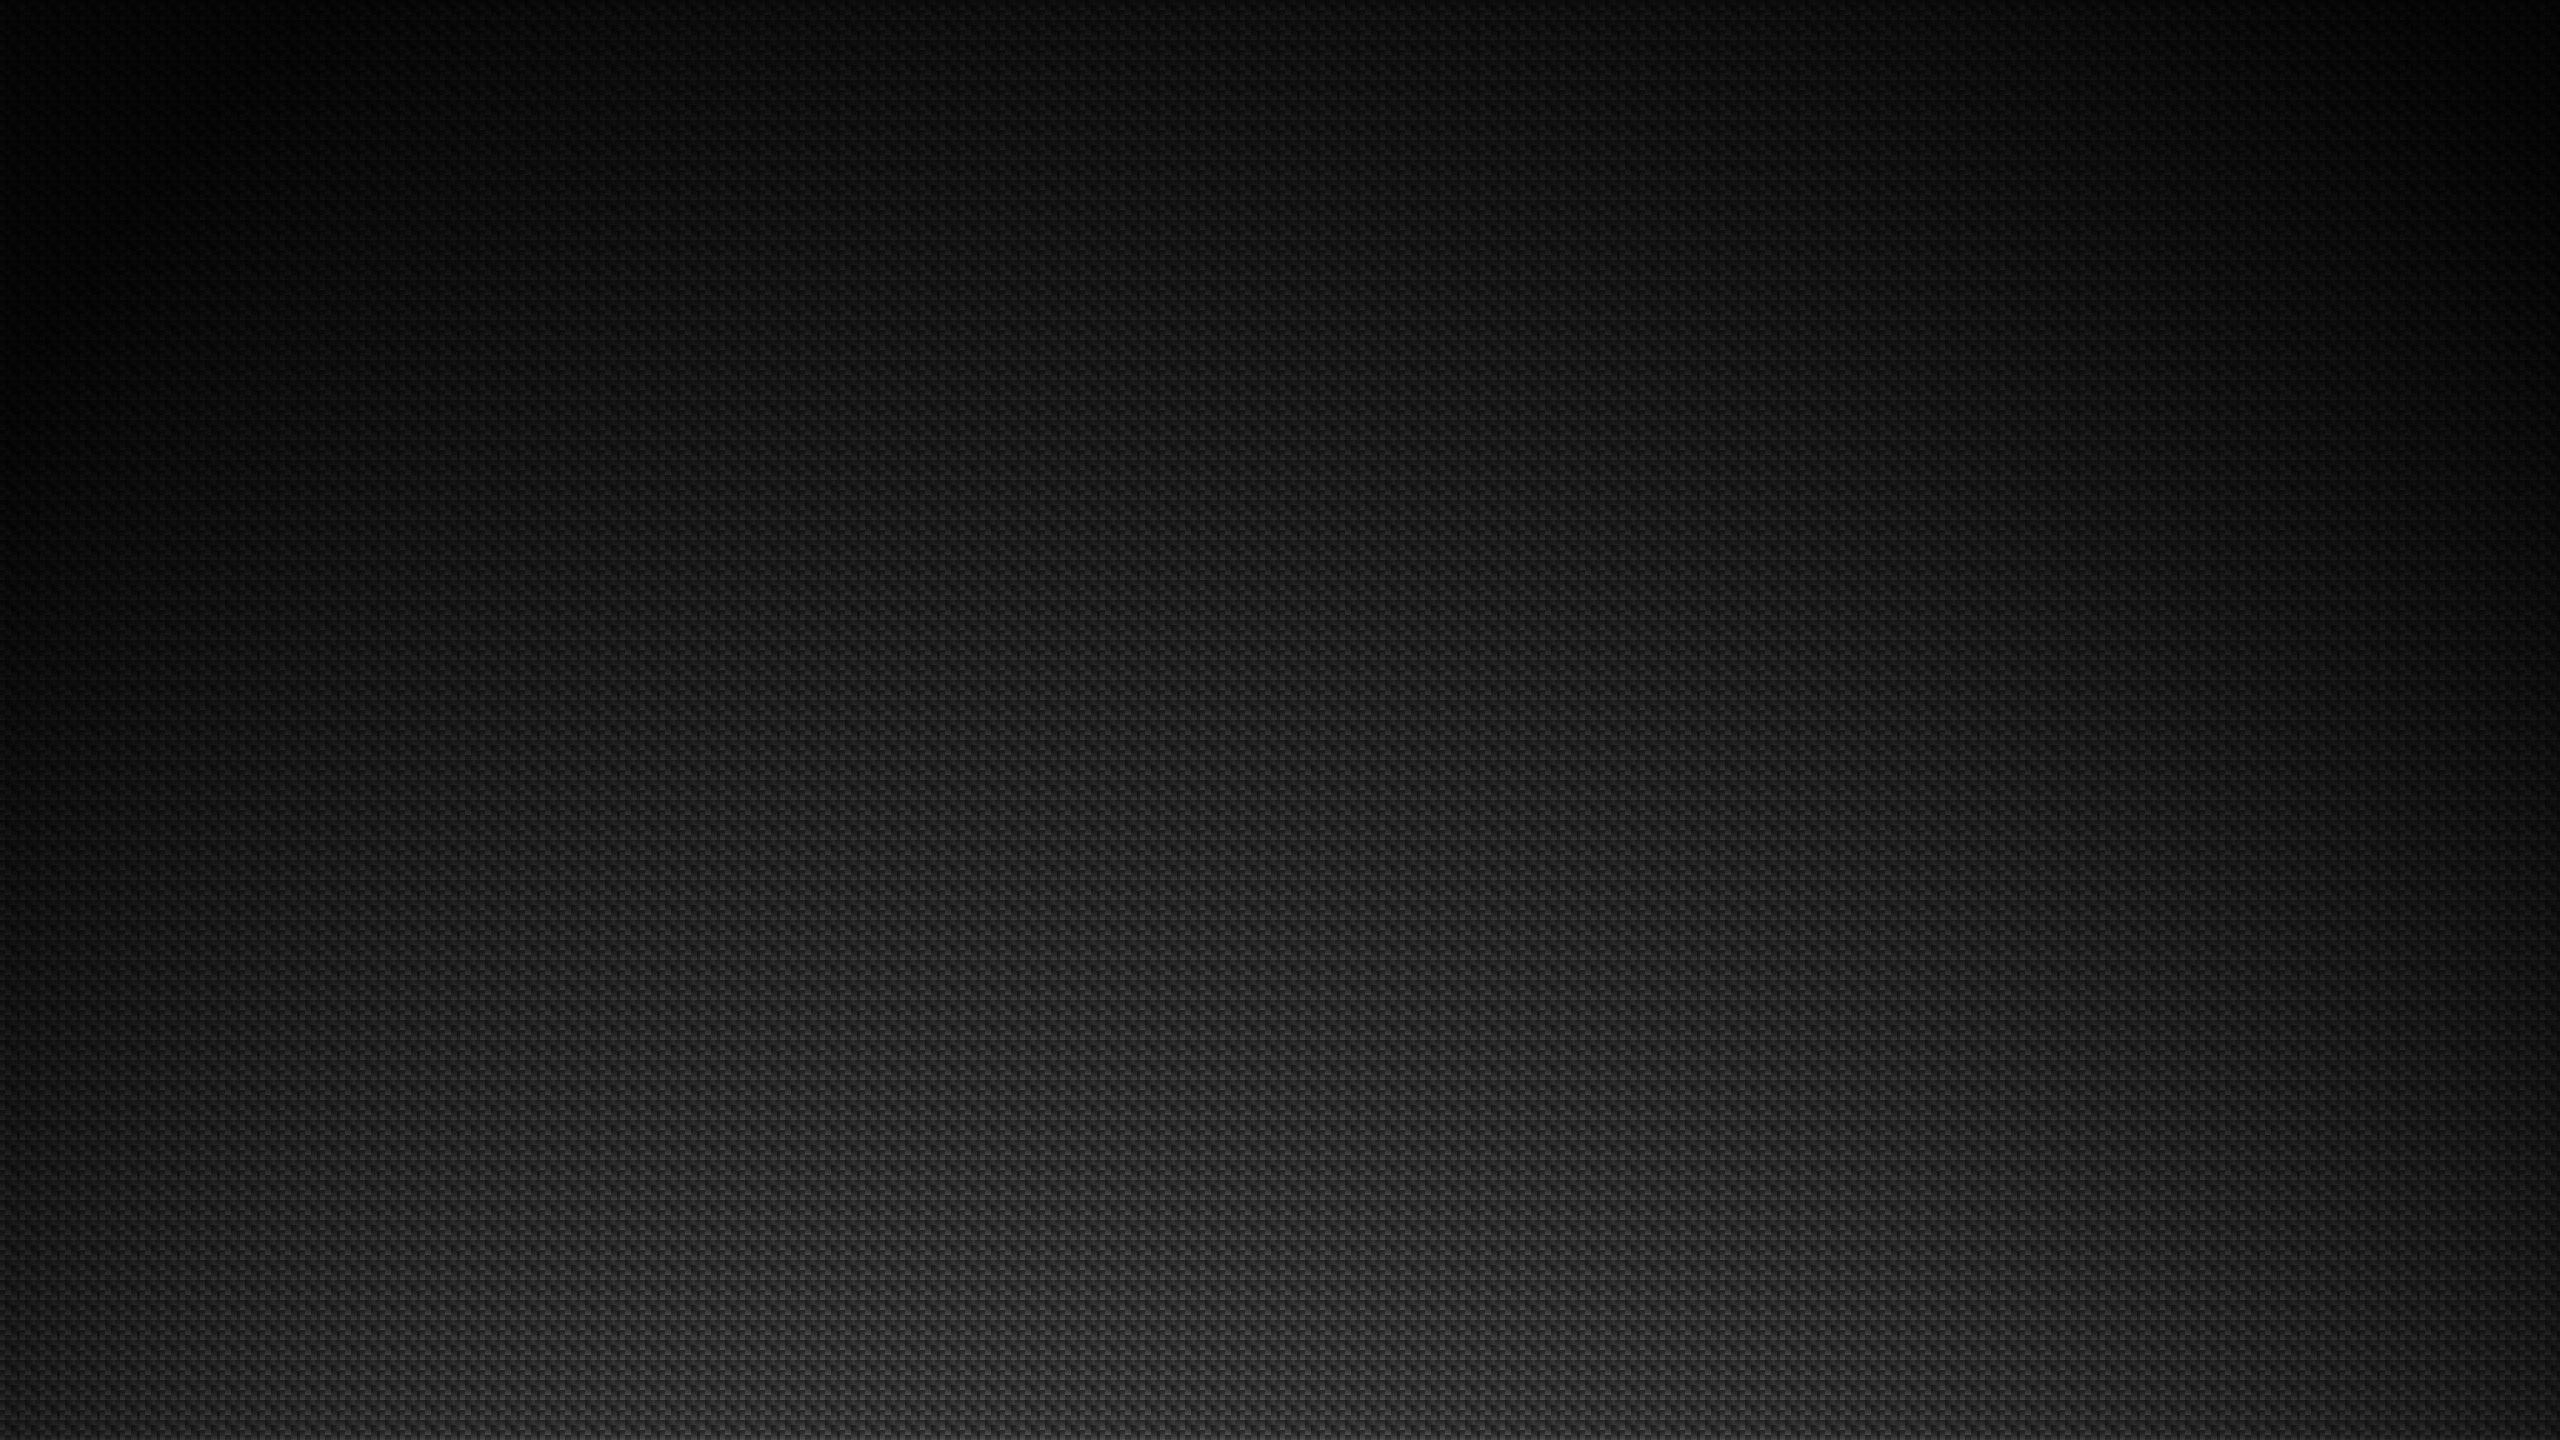 carbon fiber background mac wallpaper download free mac